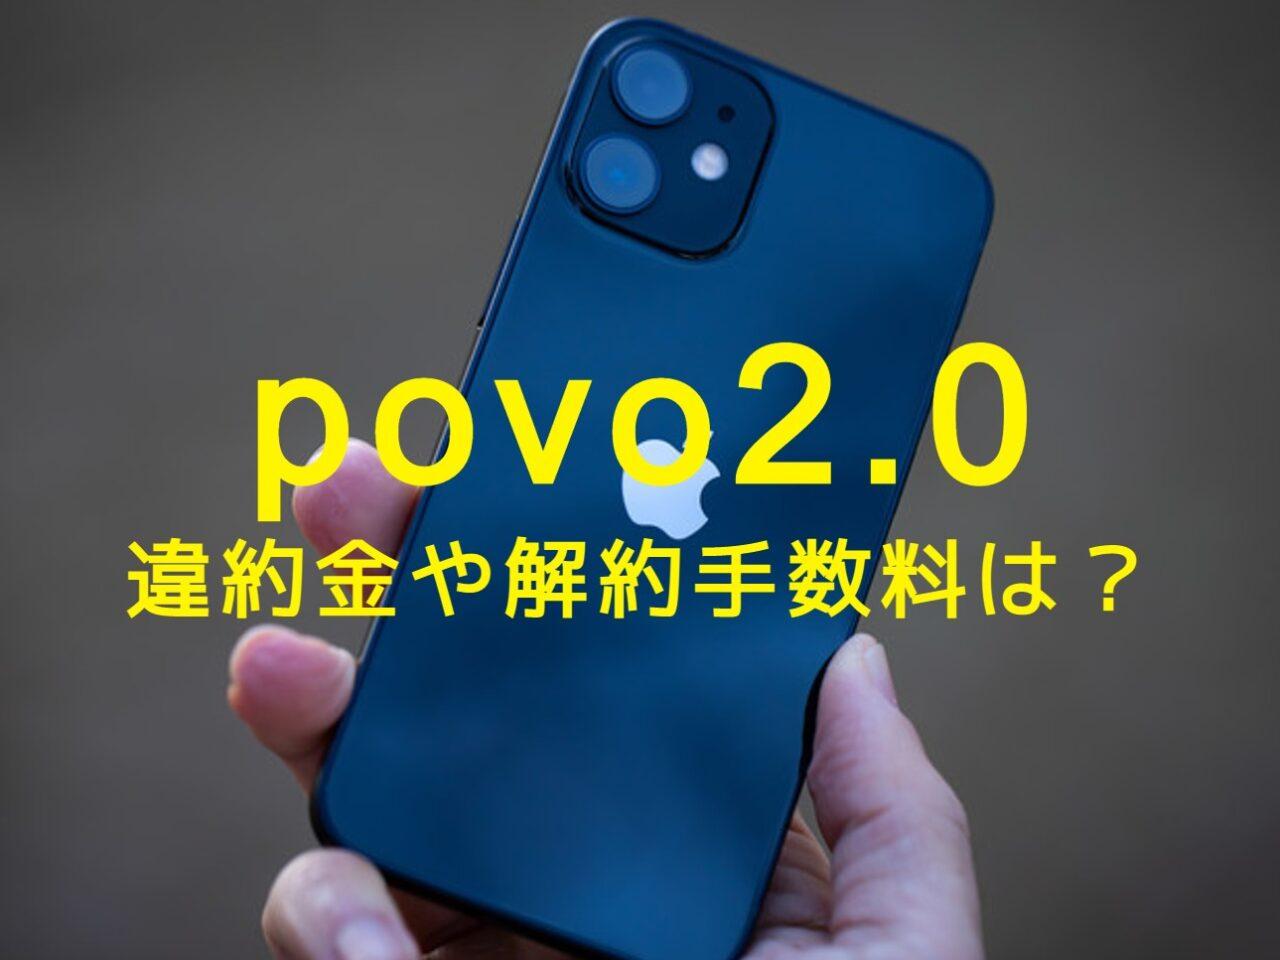 povo 2.0は違約金や解約手数料・契約解除料はある?のサムネイル画像